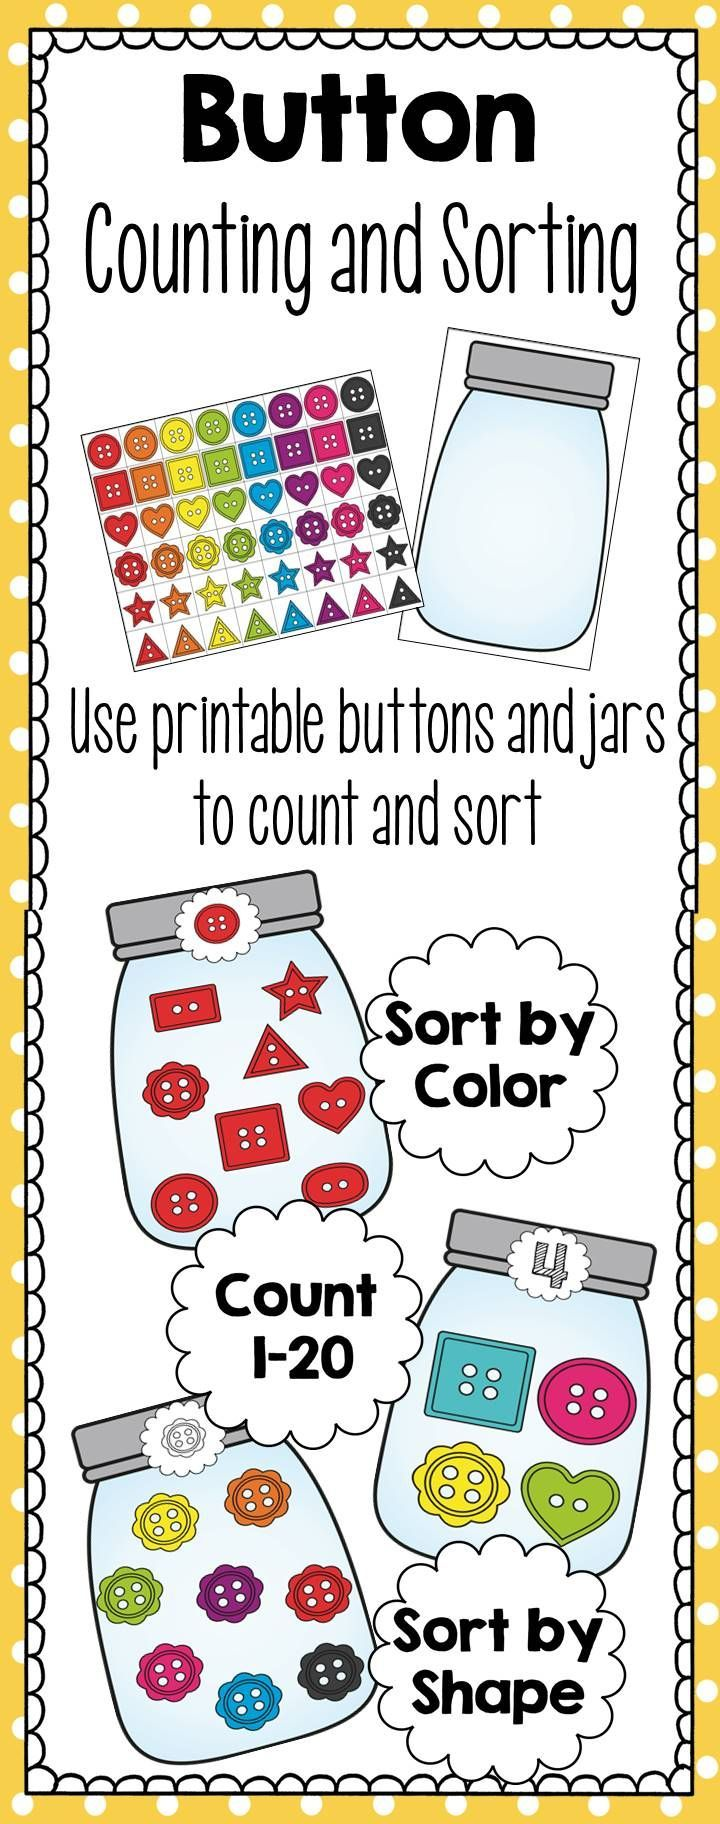 Counting And Sorting Button Jars Ccss Aligned Sorting Activities Preschool Math Kindergarten Worksheets [ 1824 x 720 Pixel ]